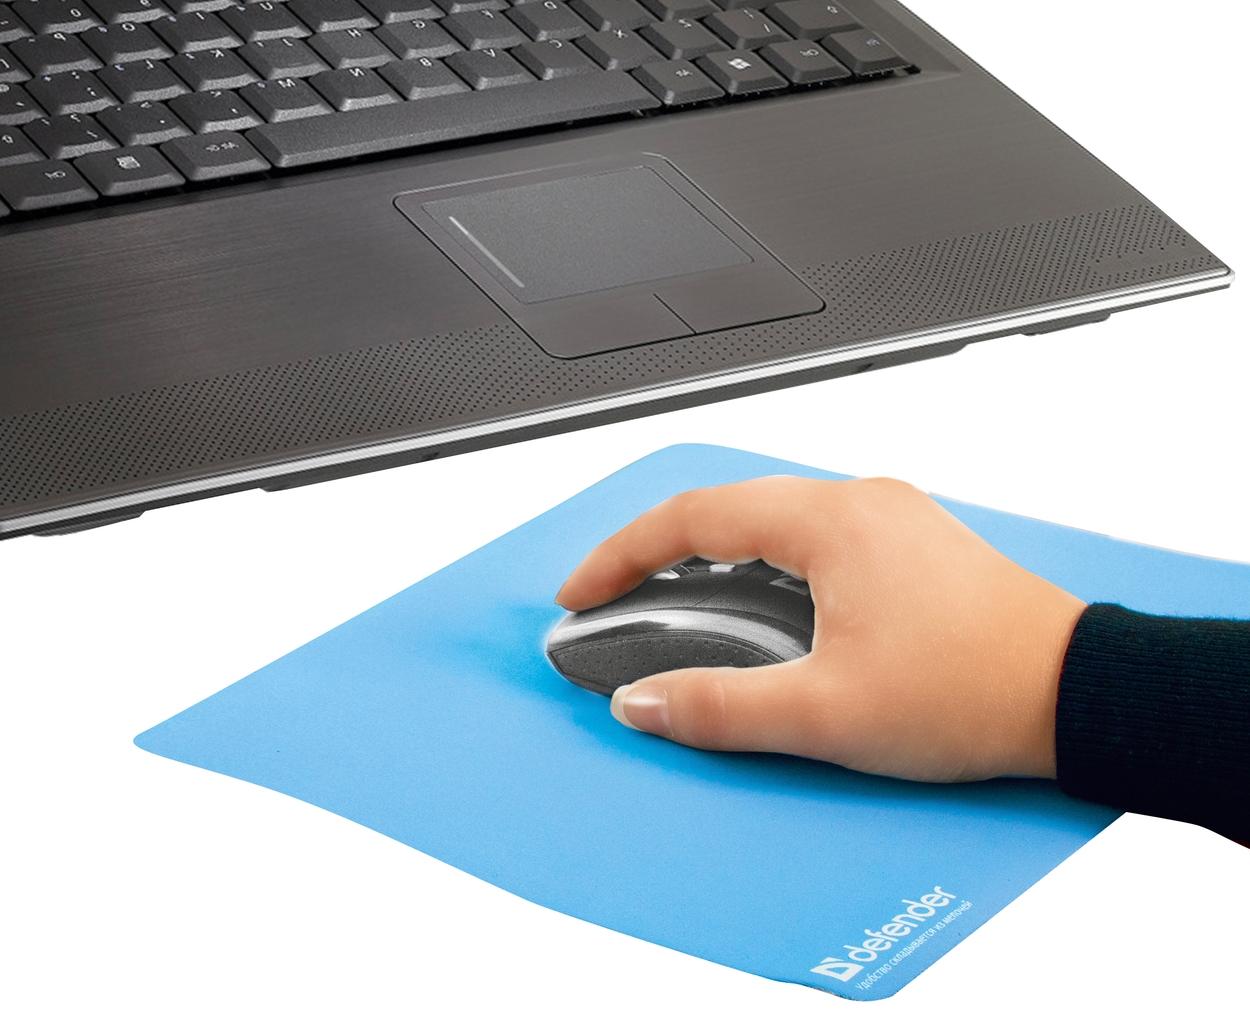 Коврик для компьютерной мыши Notebook Microfiber, 300х225х1.2мм., асорти, ассорт. Defender - фото 5